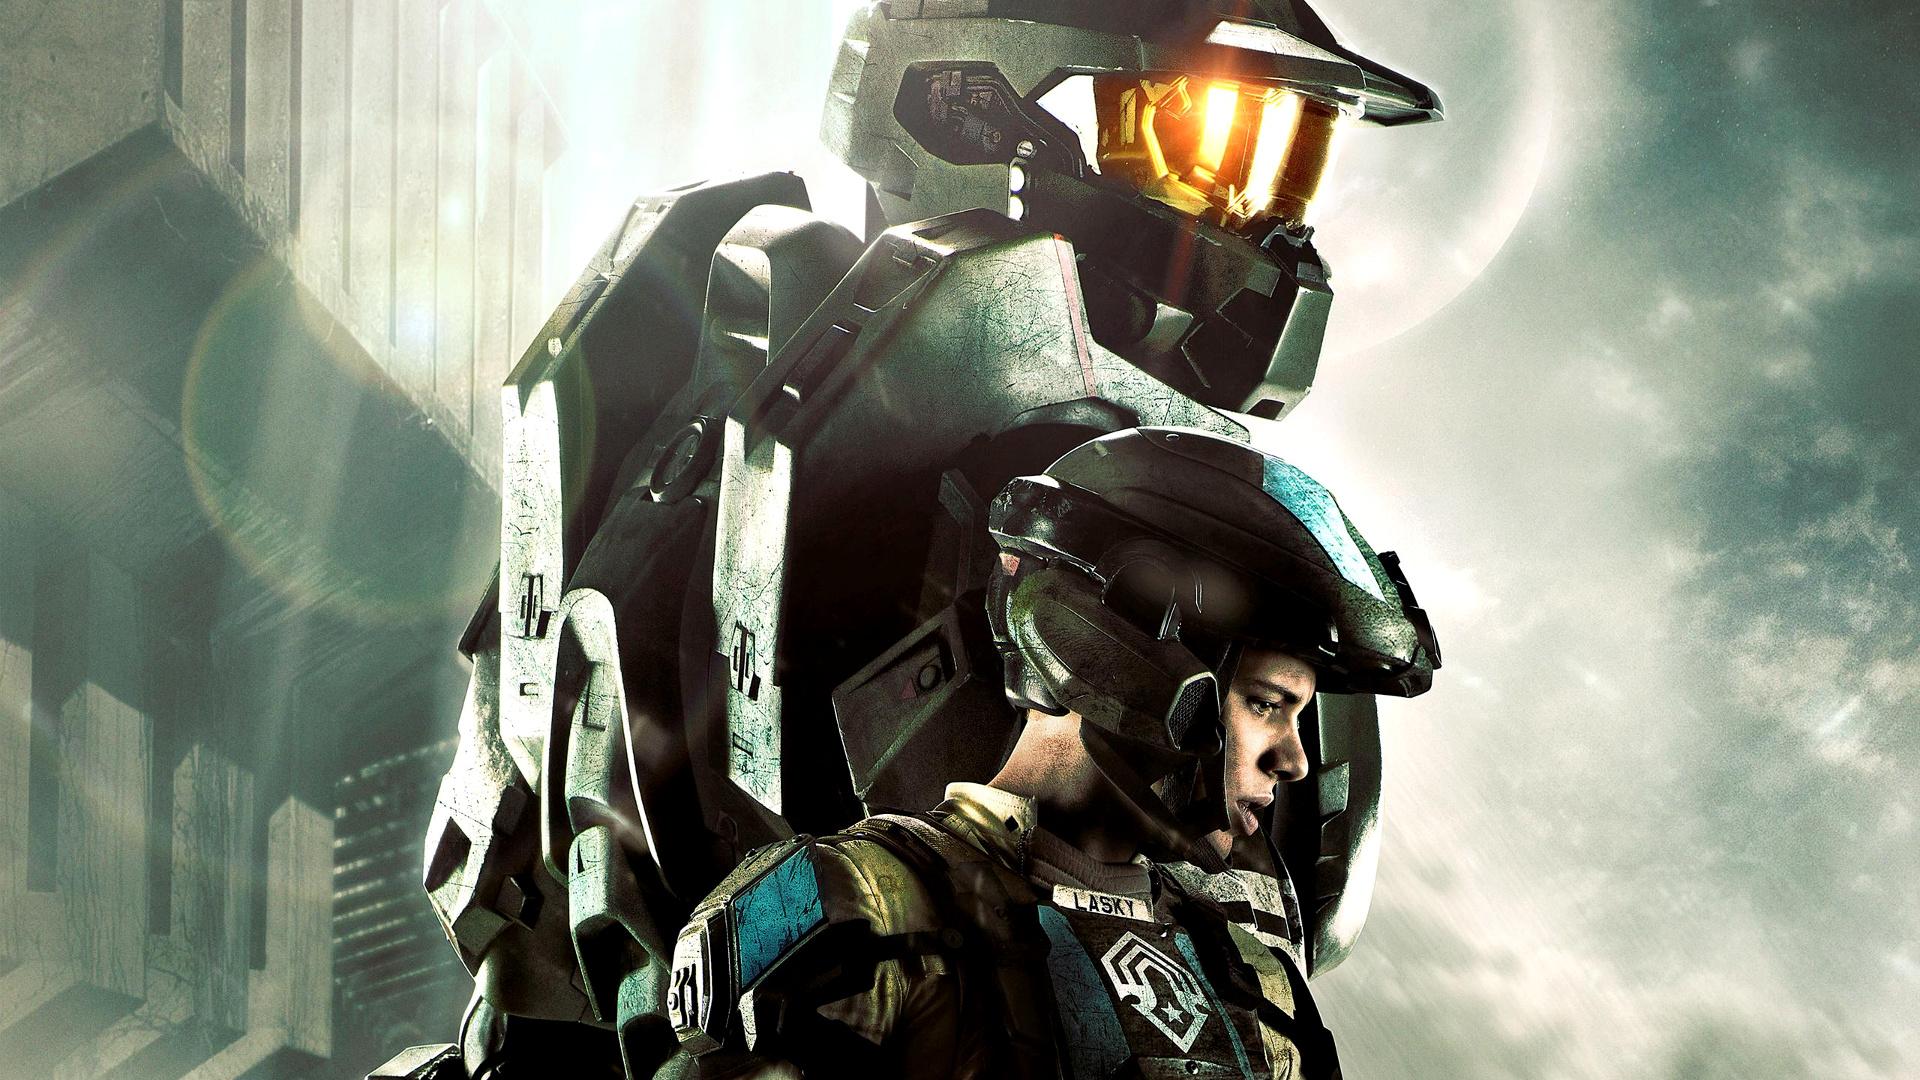 Halo 4 Forward Unto Dawn Hd Wallpaper Background Image